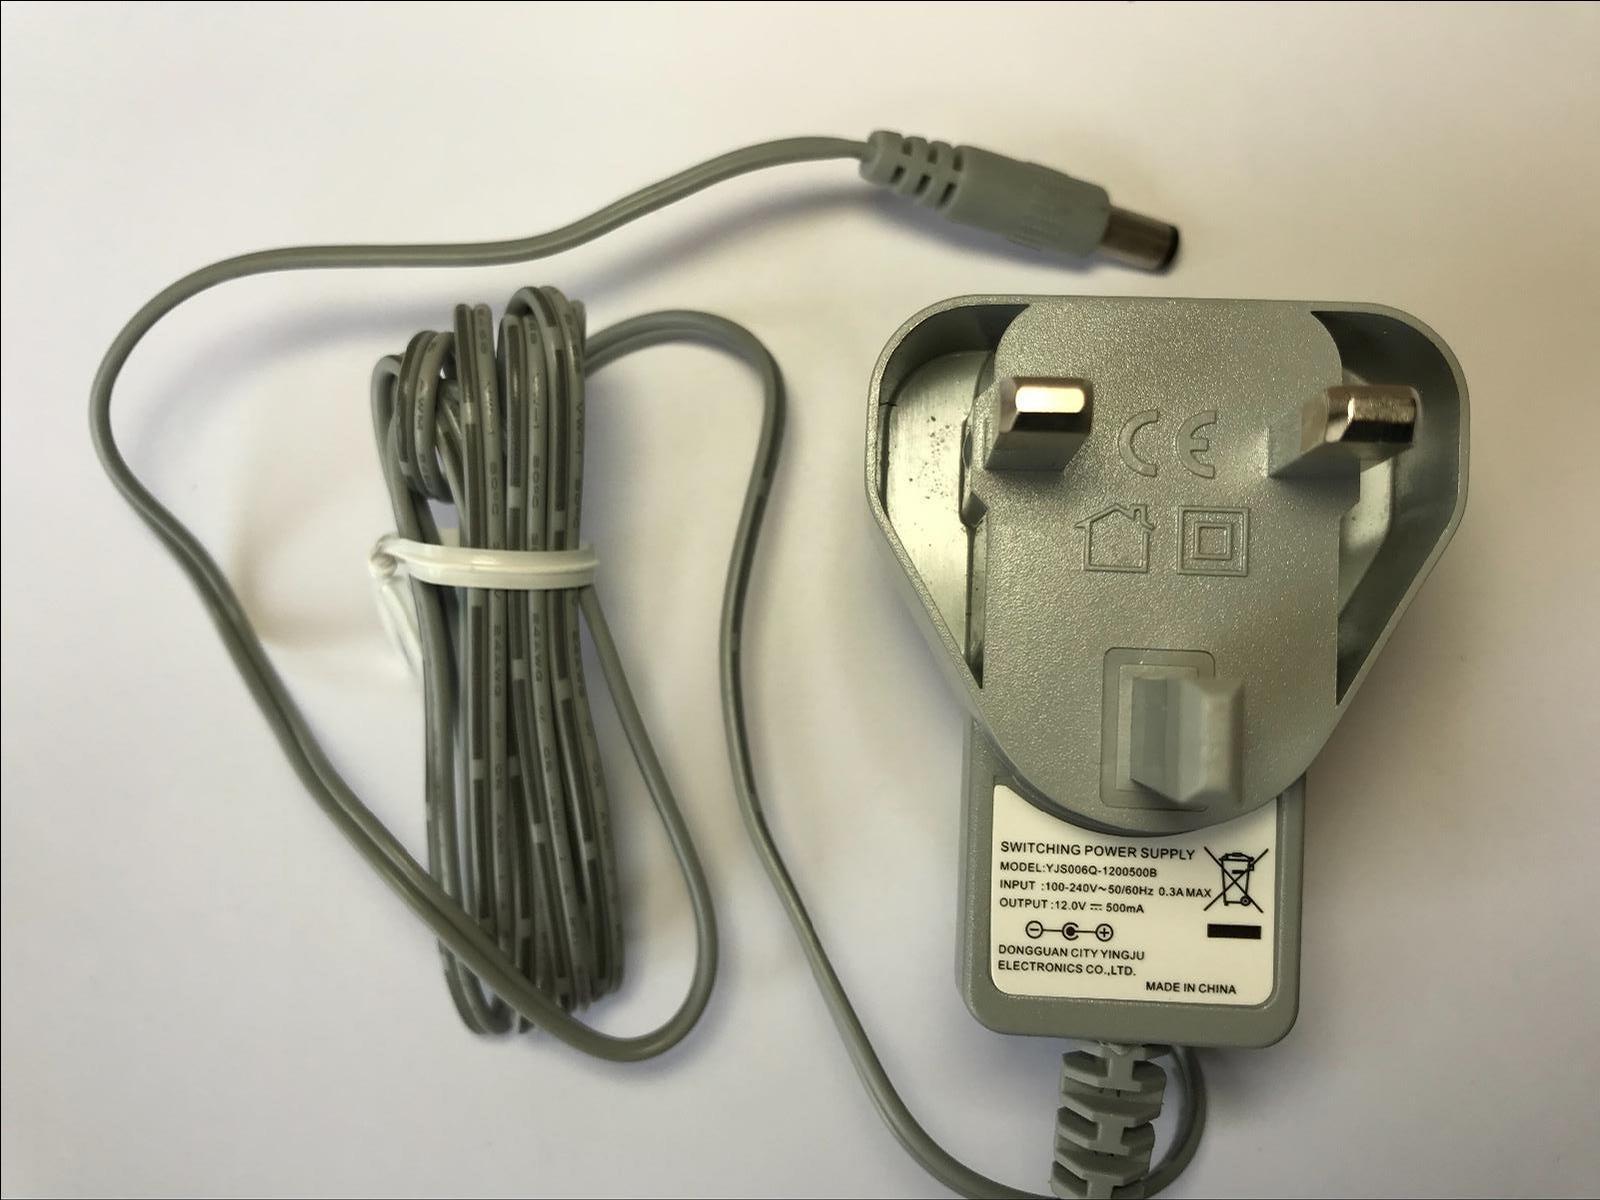 Power Supply for 12V 500mA AC Model R